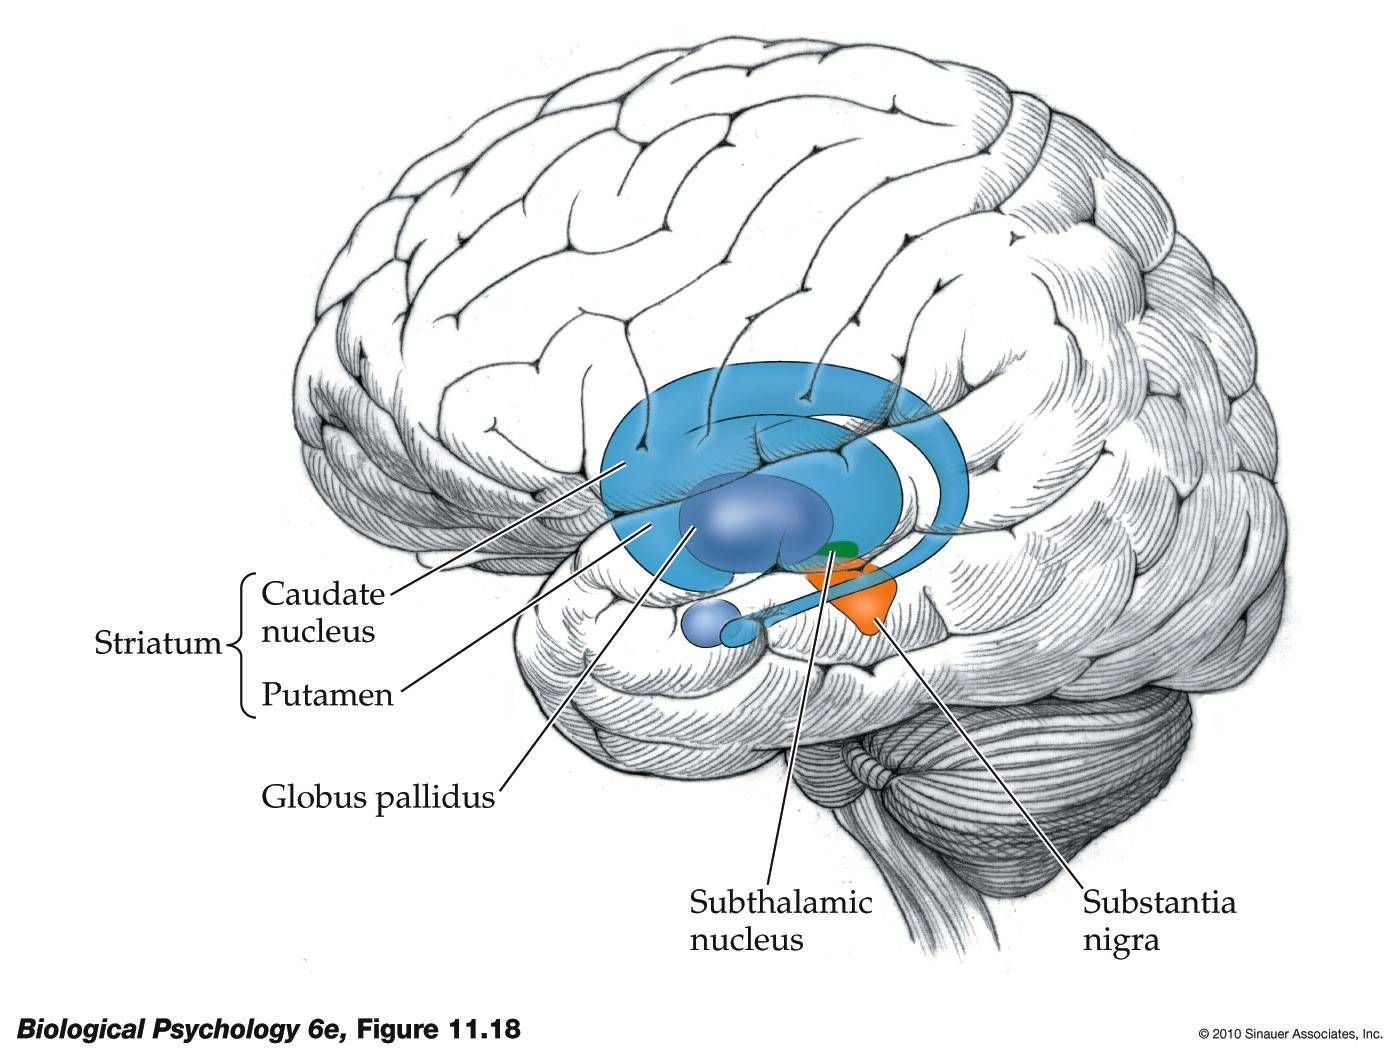 Pin by Erica Verrillo on Myalgic Encephalomyelitis / Chronic Fatigue ...